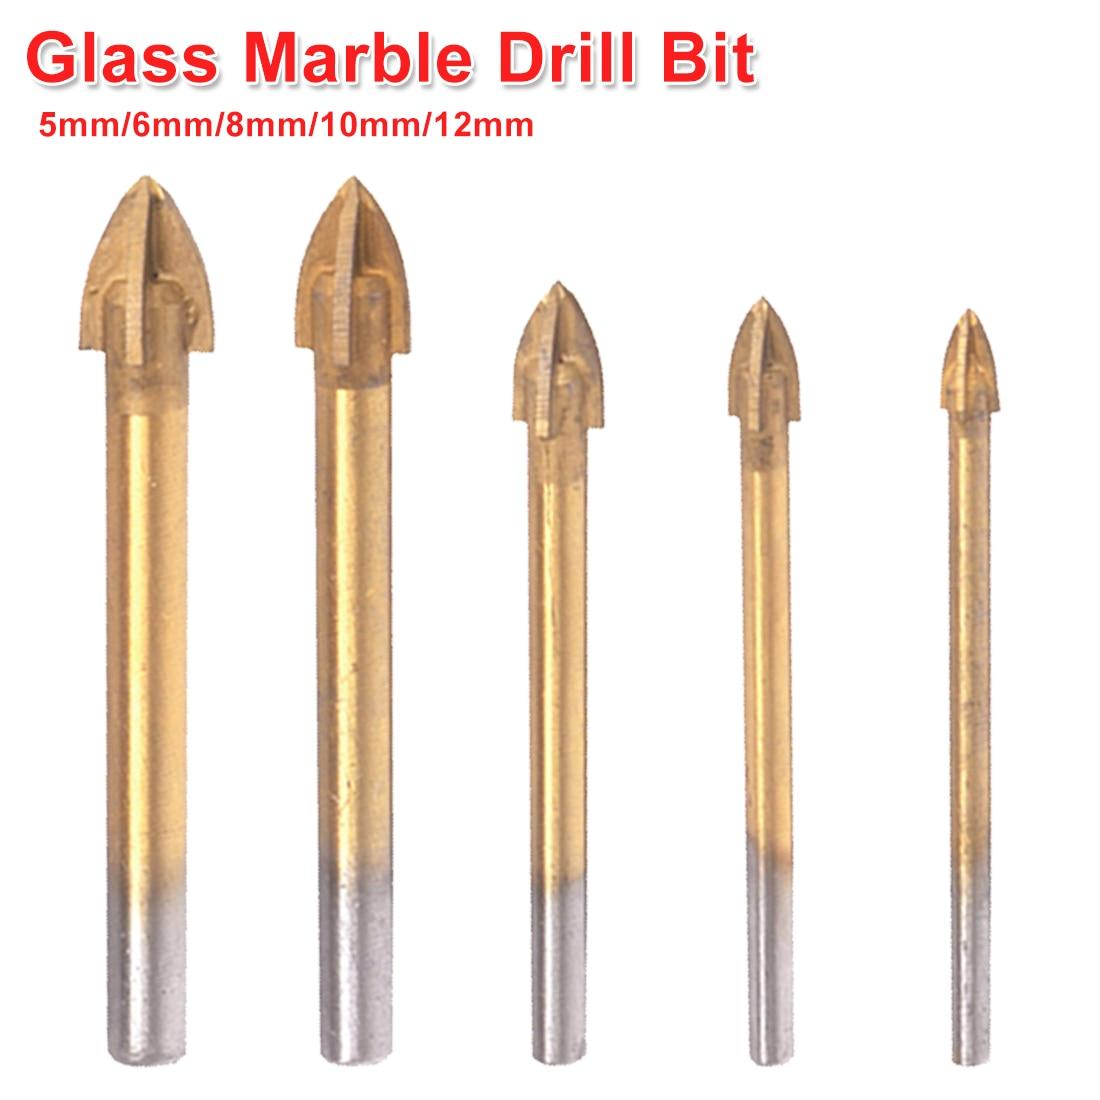 Tungsten Carbide Cross Spear Head Drill Titanium Coated Ceramic Tile Glass Marble Drill Bit Round Shank 5mm/6mm/8mm/10mm/12mm